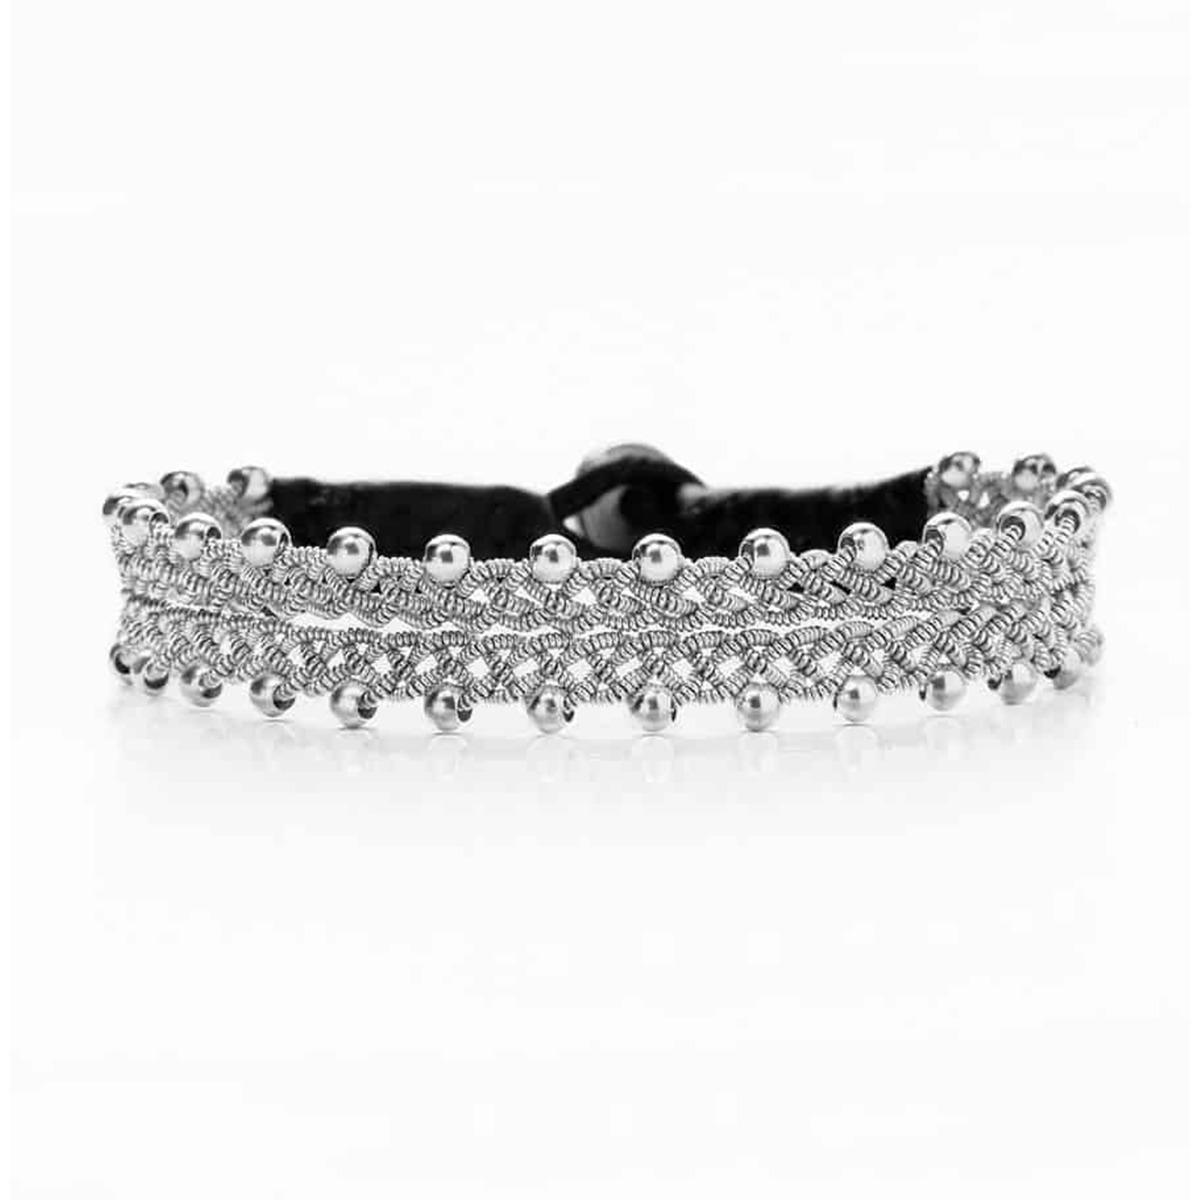 Designtorget Armband tenn/silver 17